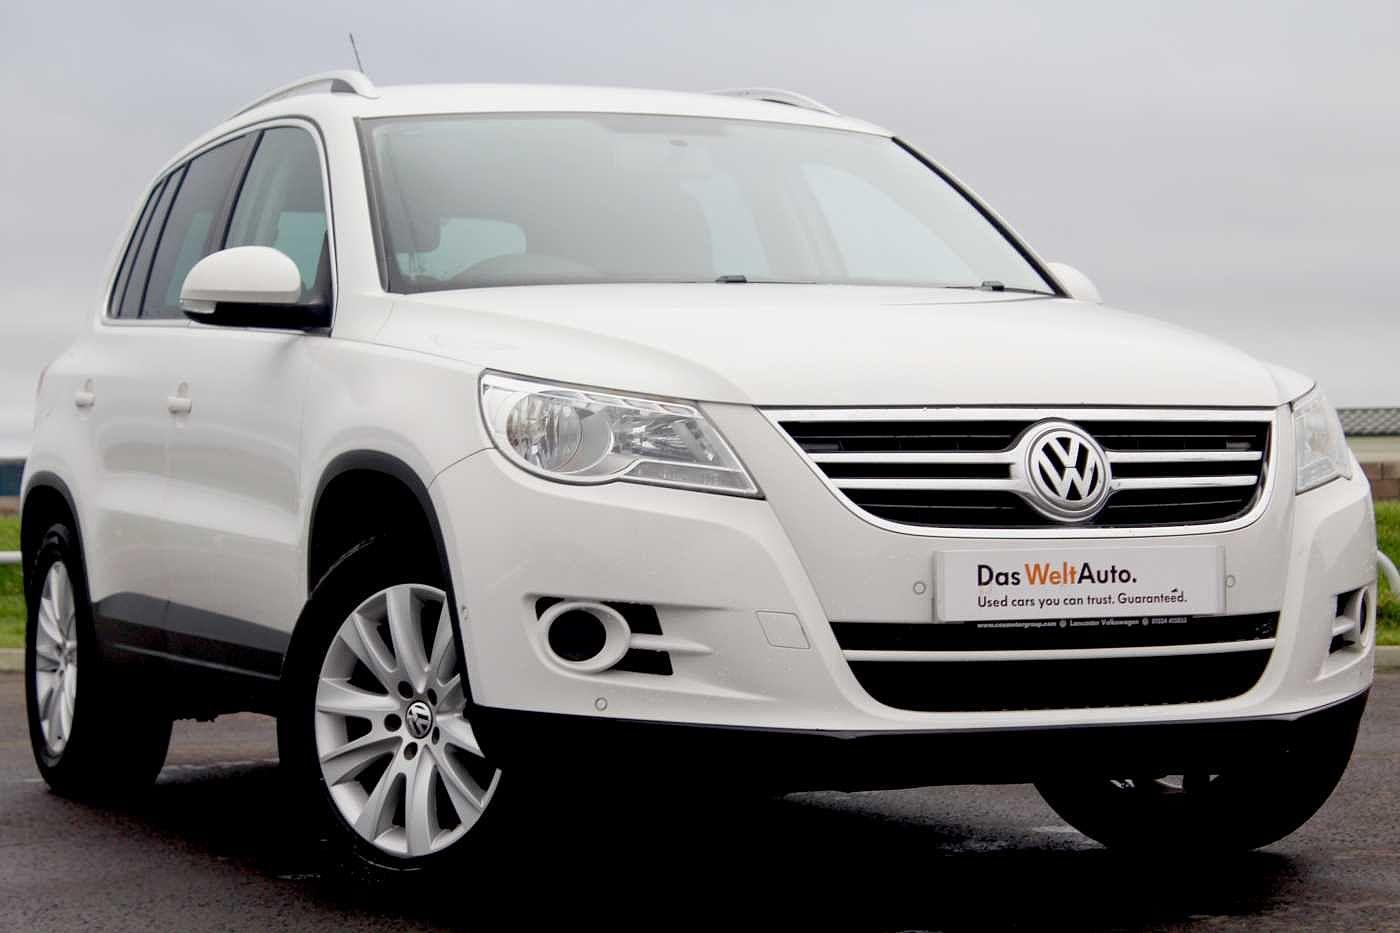 Volkswagen Tiguan 2.0 TDI Match 4Motion 5-Dr